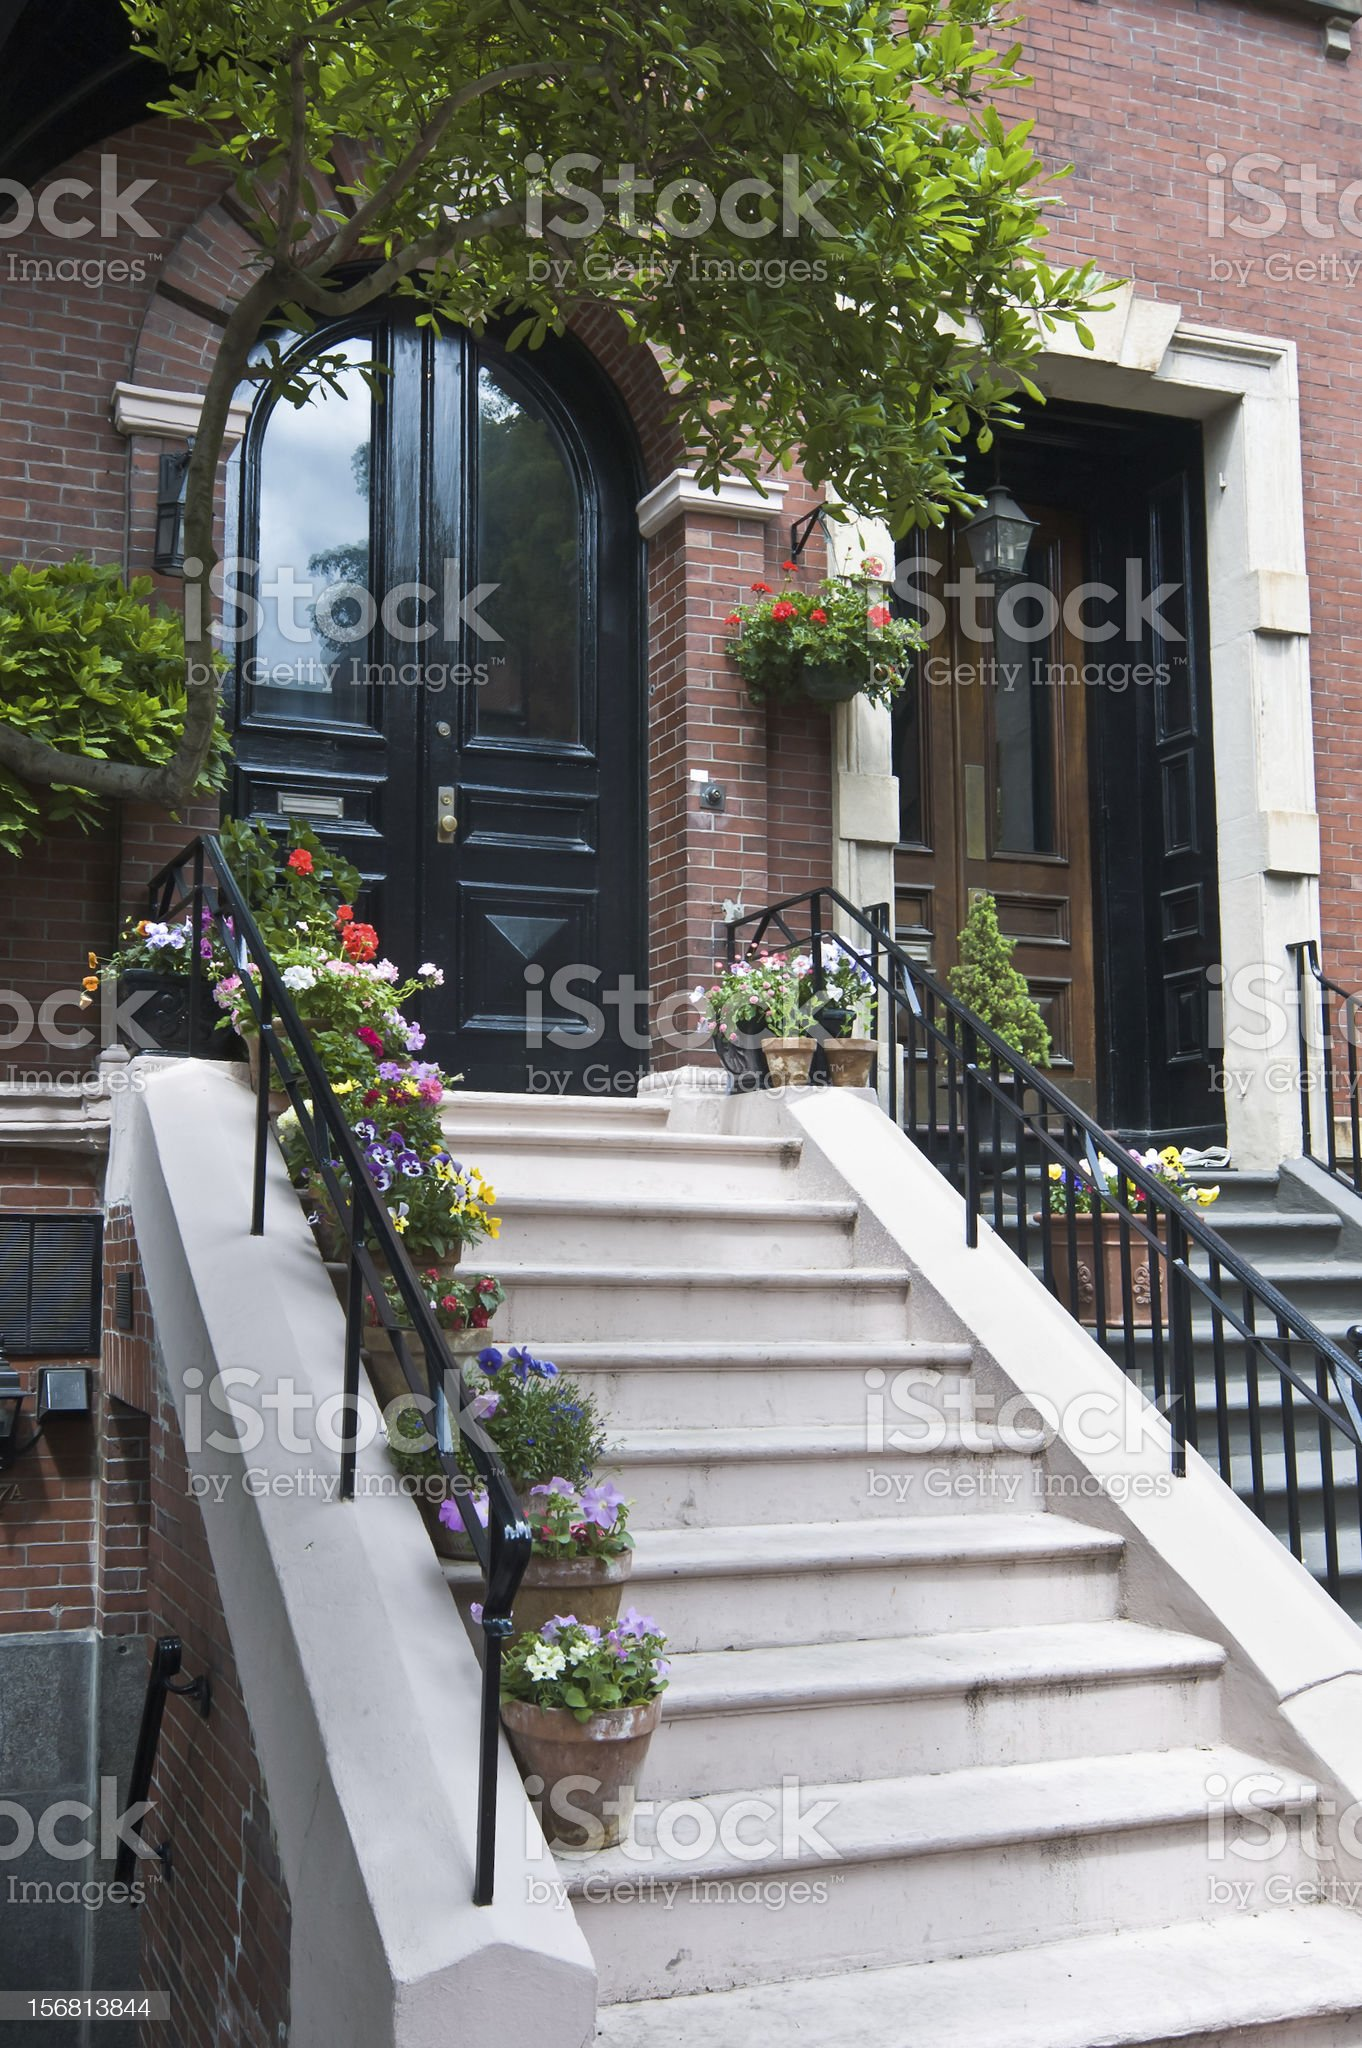 Stairway Garden royalty-free stock photo